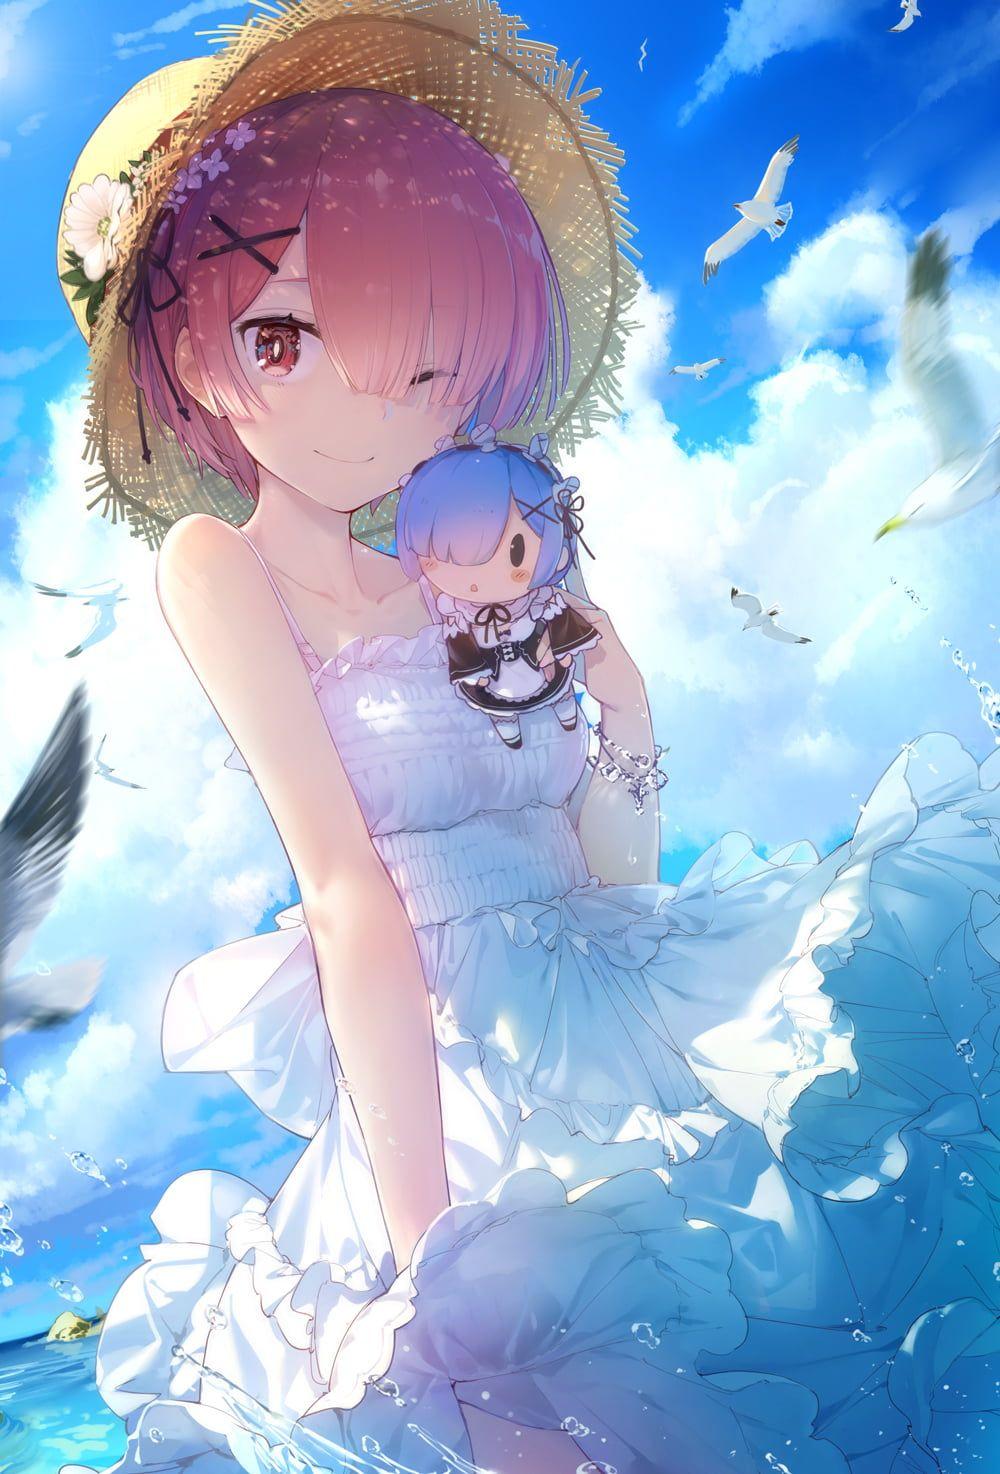 Anime Anime Girls Digital Art Artwork Vertical Portrait Display 720p Wallpaper Hdwallpaper Desktop Arte De Anime Dibujar Ojos De Anime Fondo De Anime